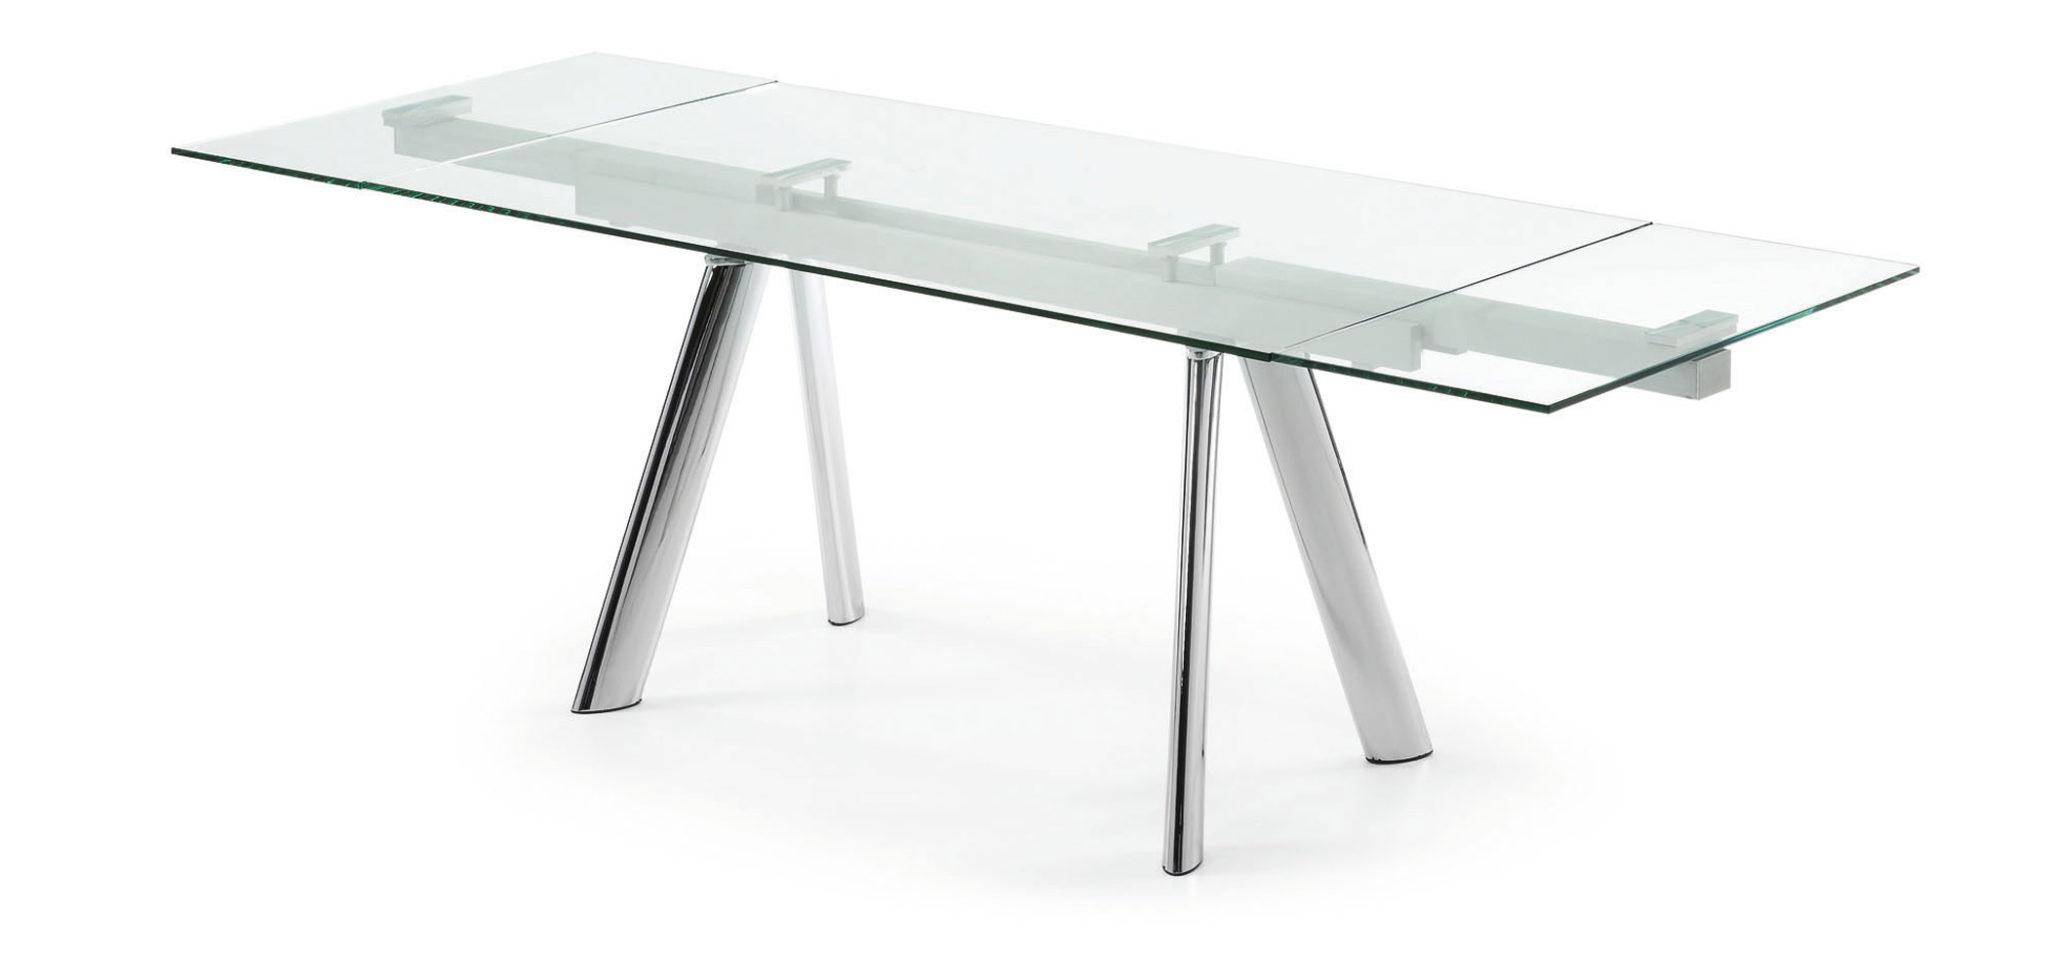 Mesa Extensible Cristal S5d8 Mesa Extensible De Cristal Transparente Y Acero Cromado Bianchi